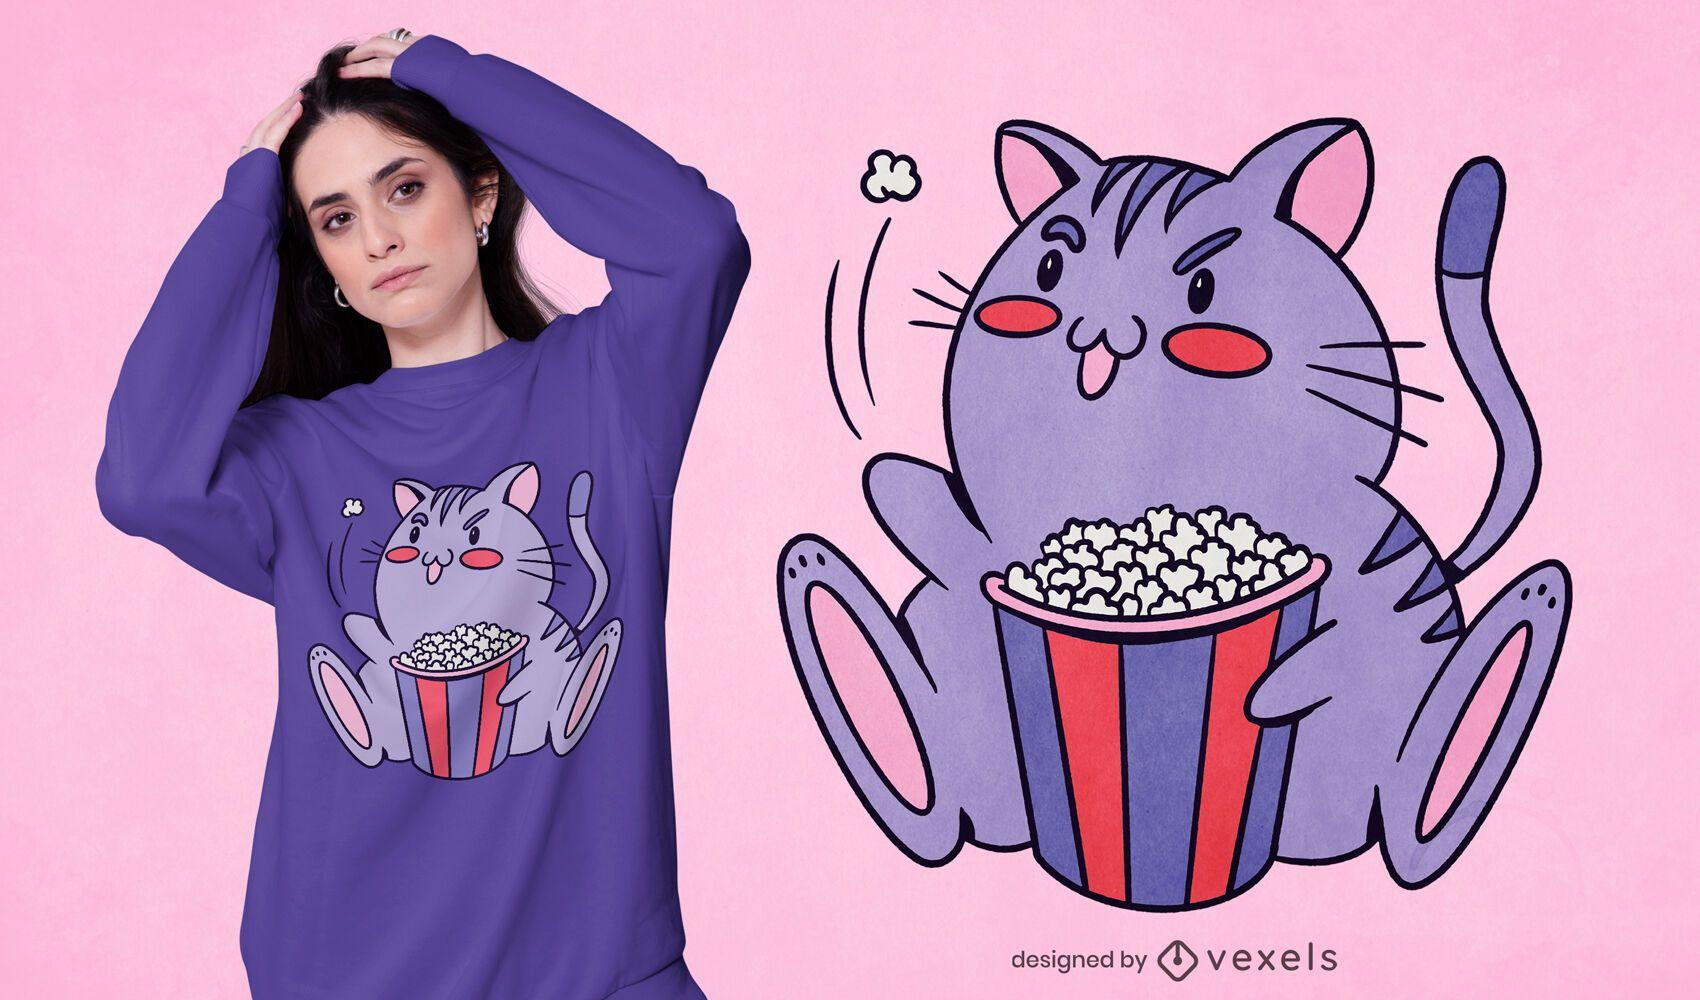 Popcorn cat t-shirt design